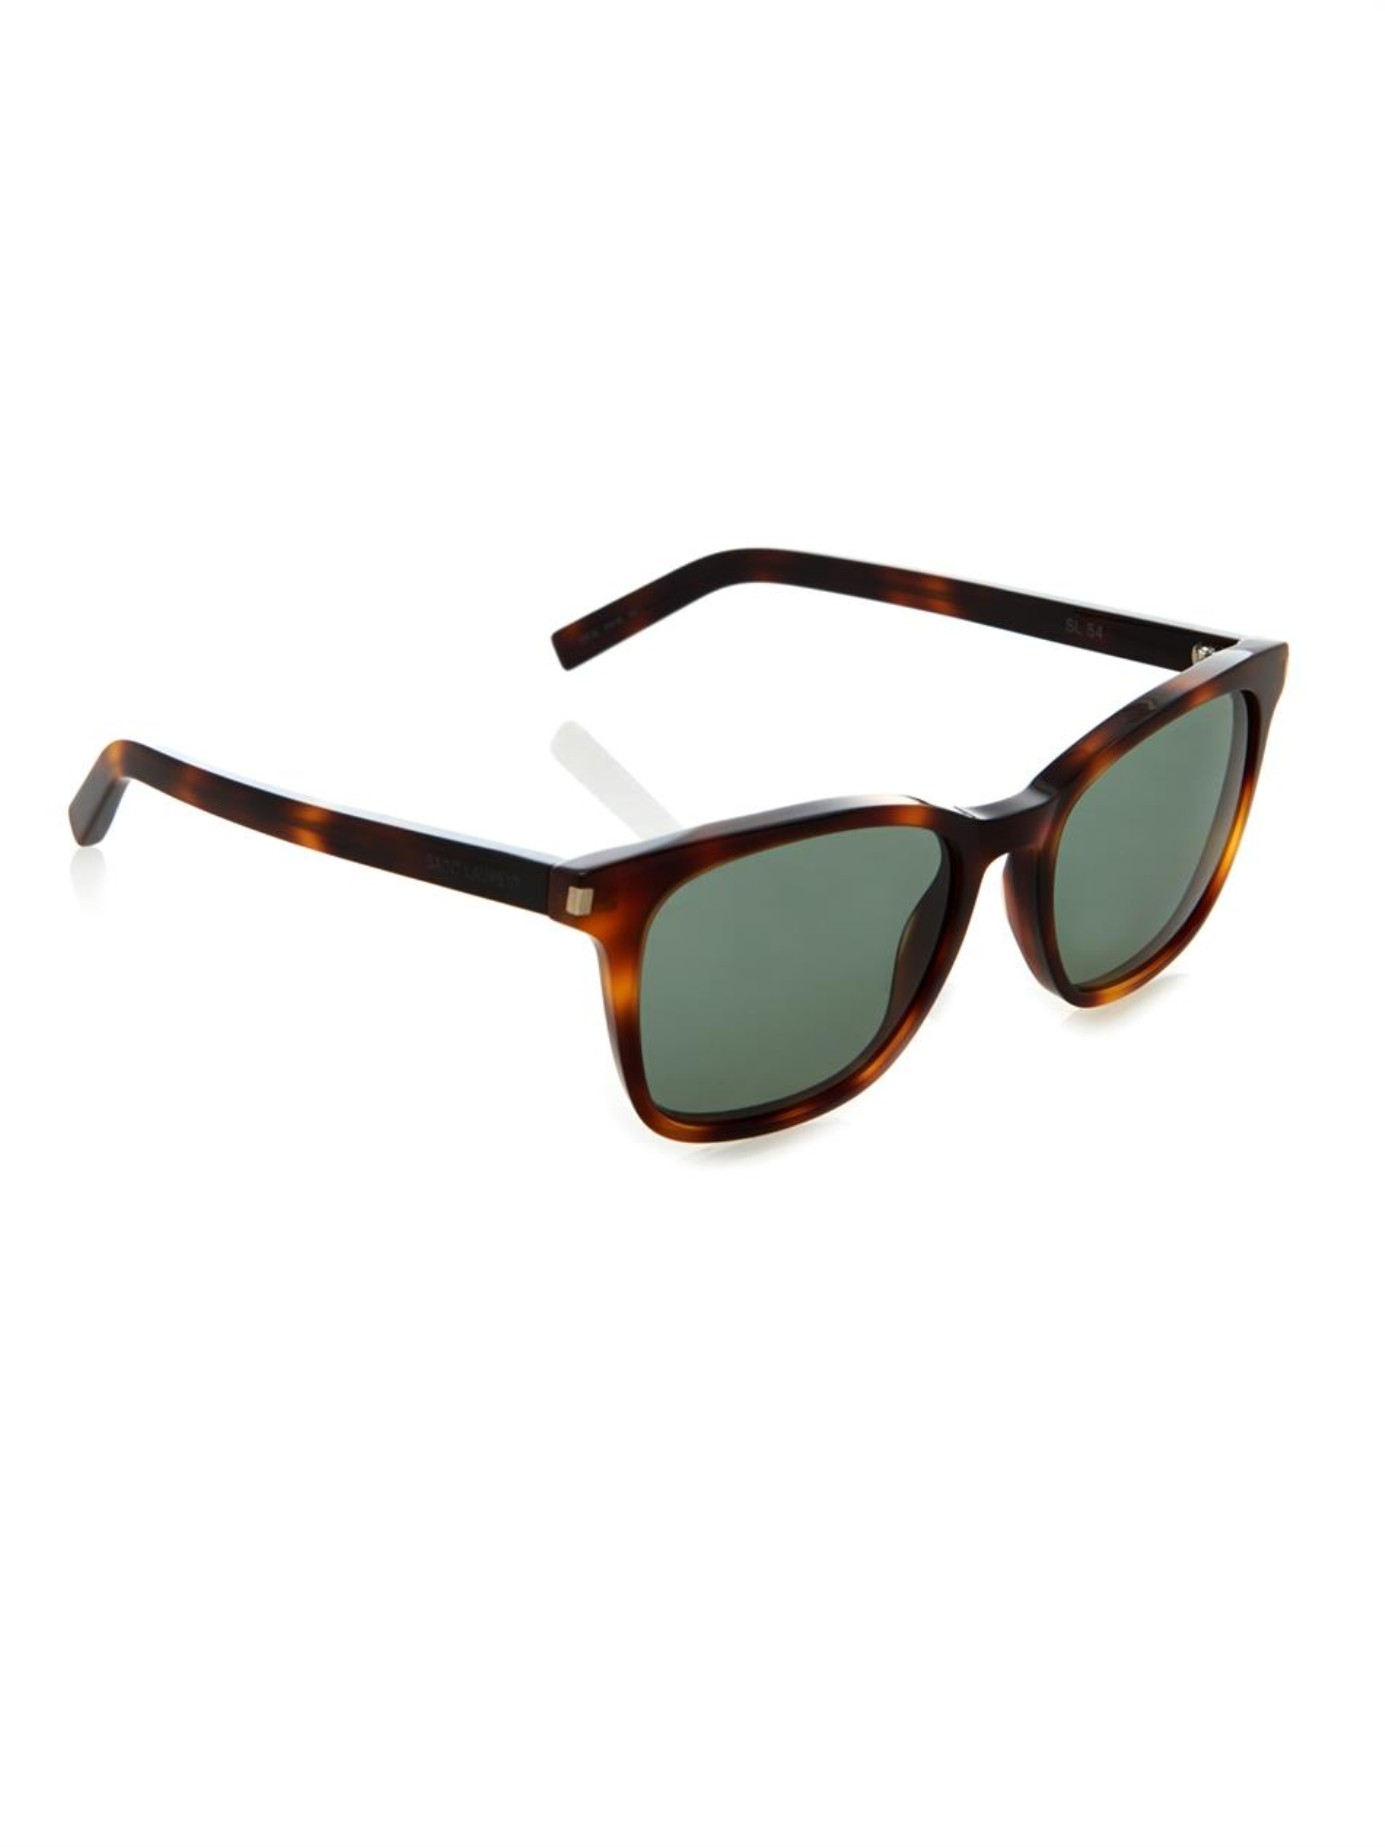 Gafas rectangulares Laurent Eyewear Carey Saint qwwxra1X